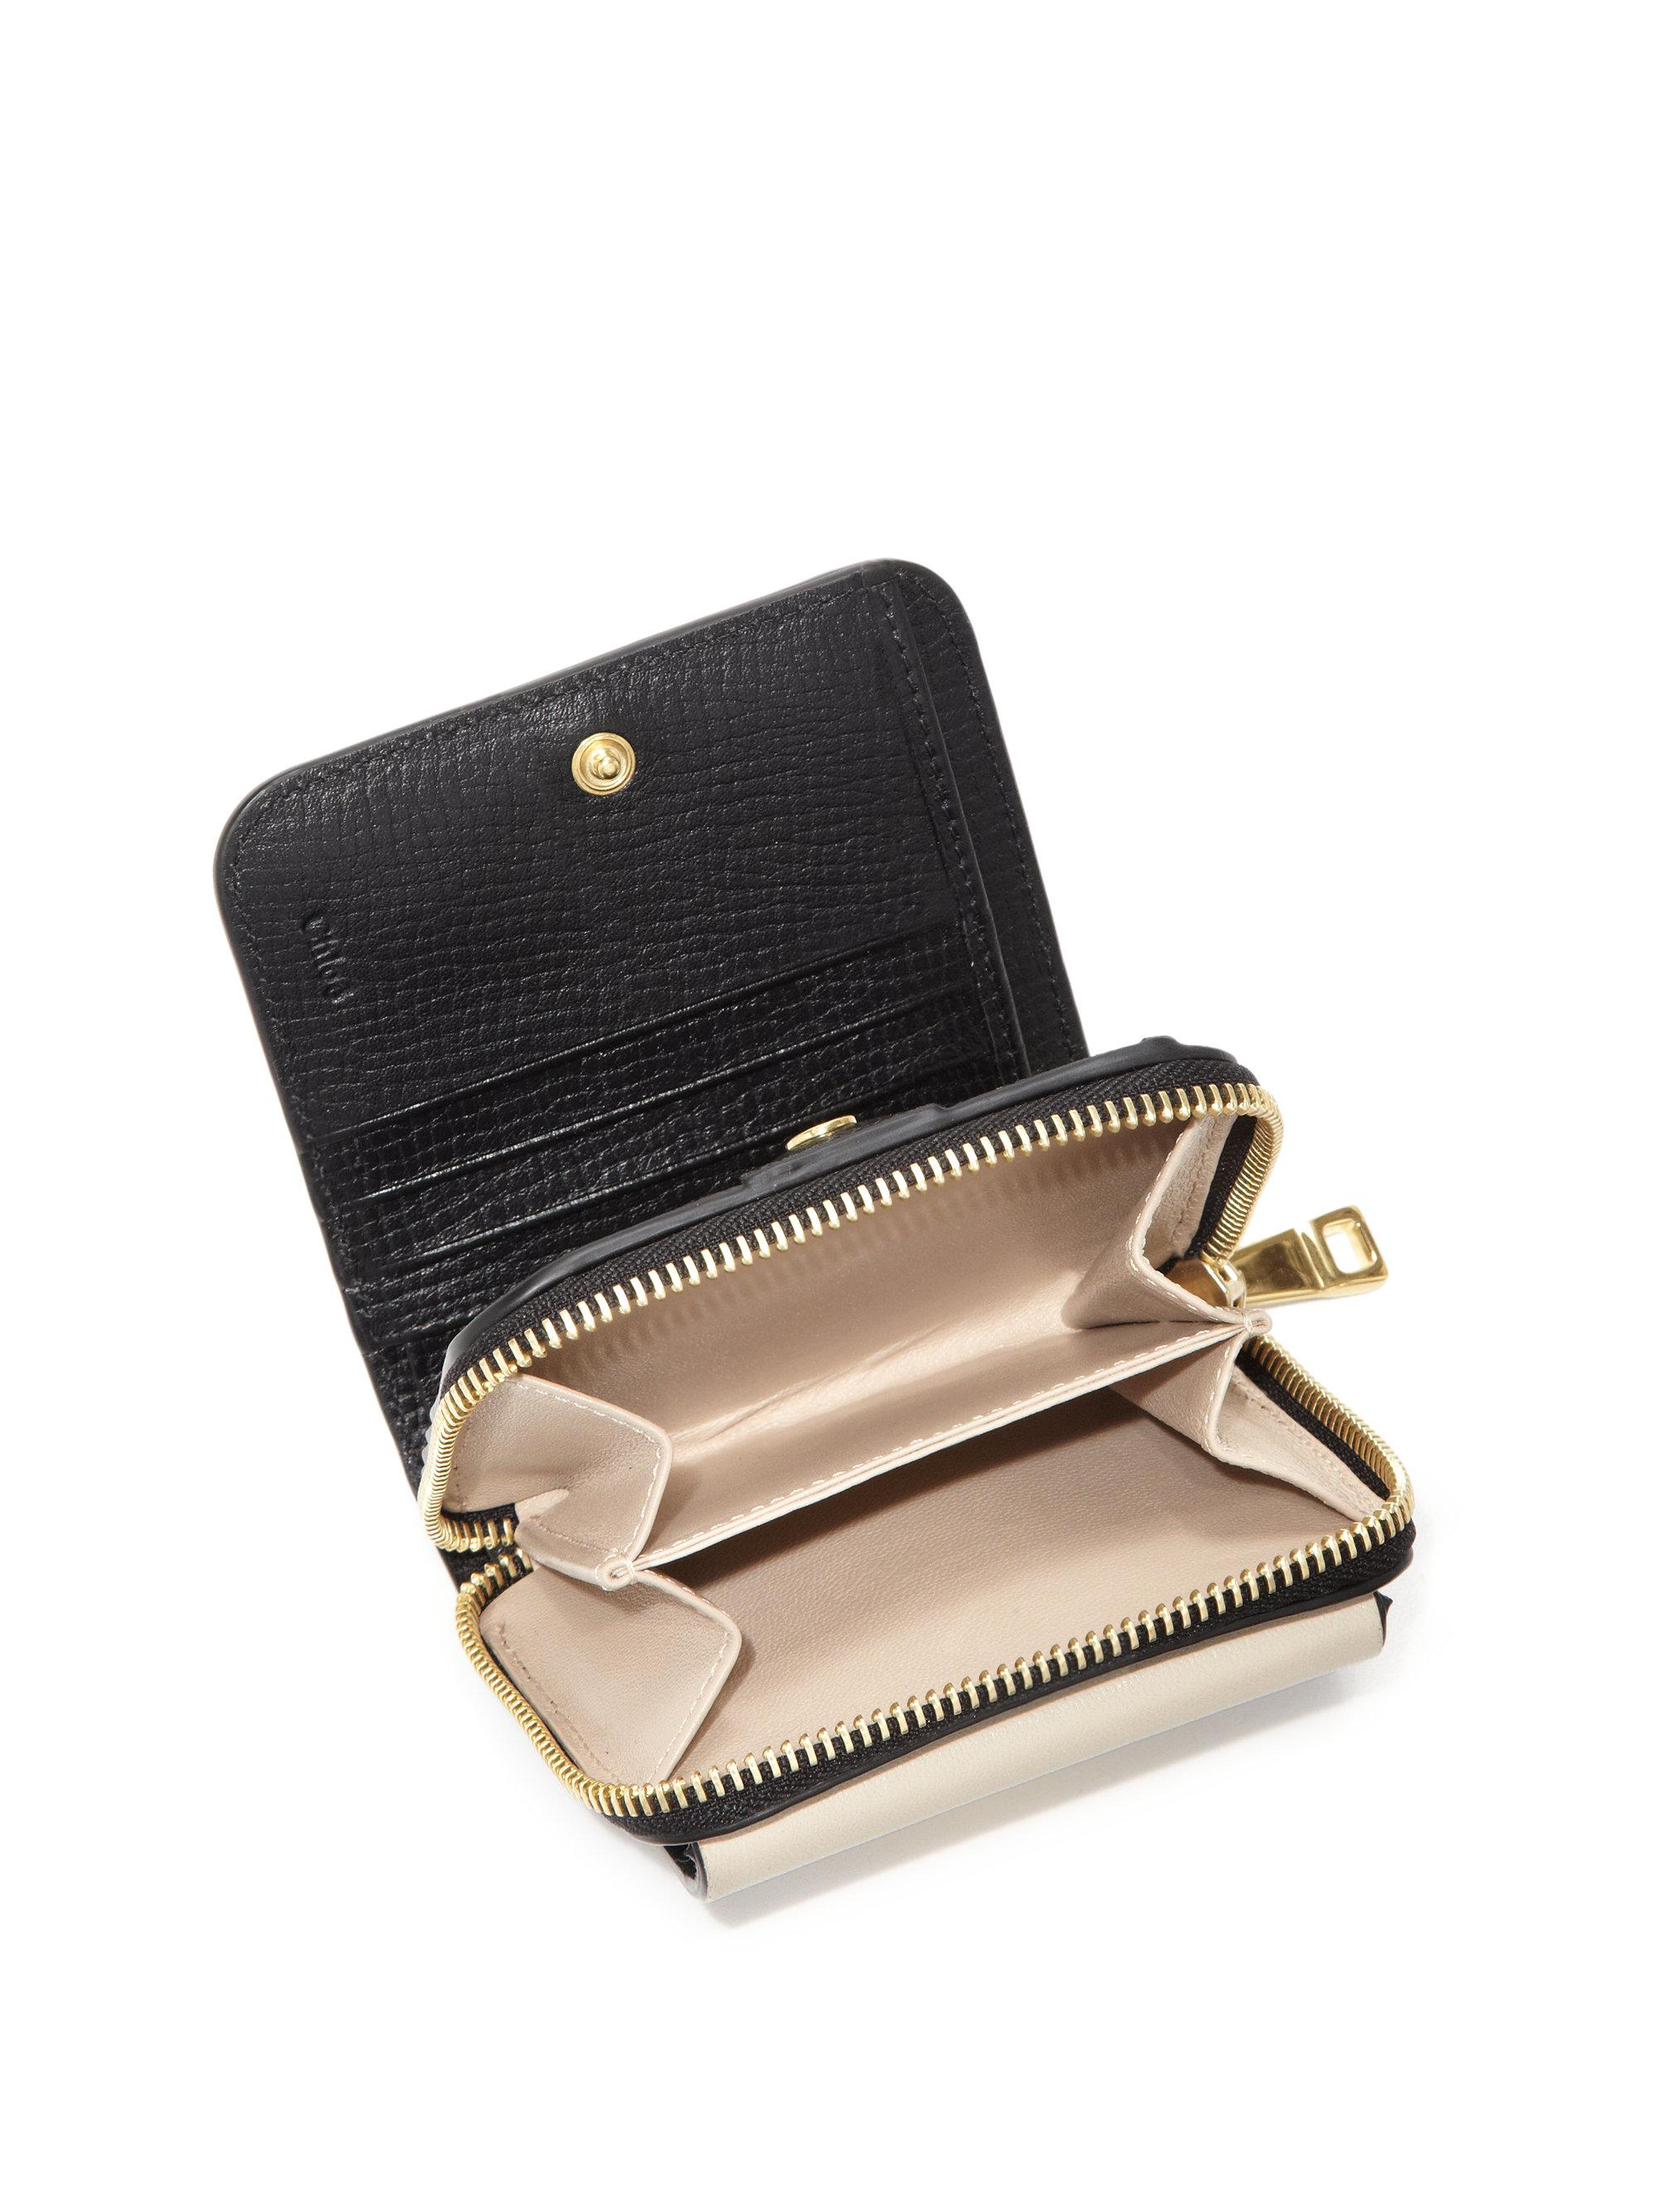 chloe handbags shop online see by chloe purse. Black Bedroom Furniture Sets. Home Design Ideas